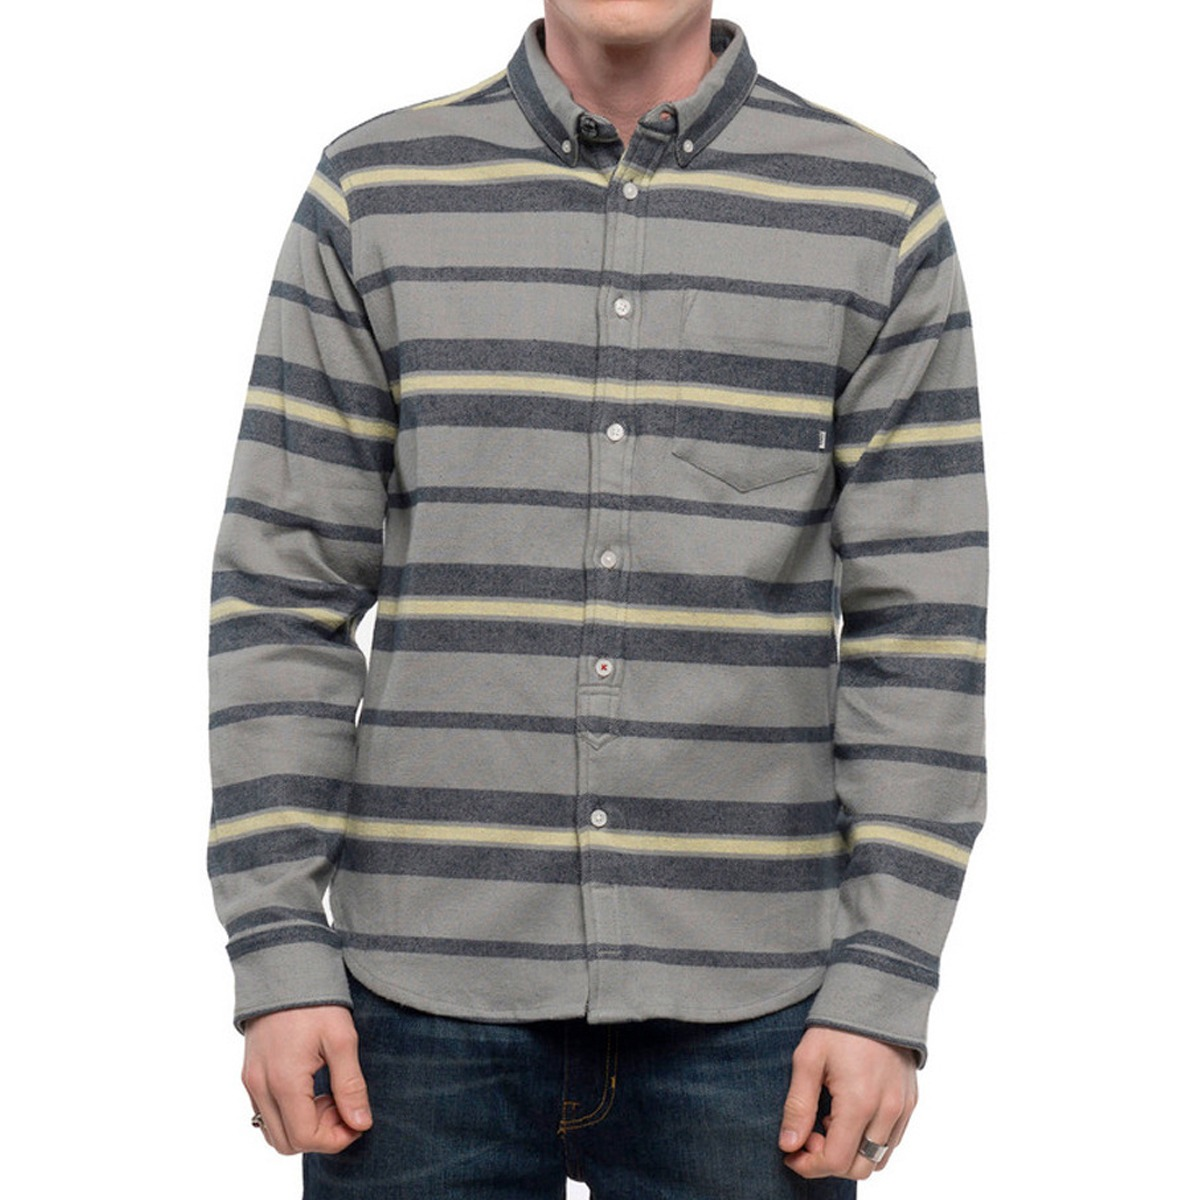 152c28d41 camisa masculina listrada skate element pollock cinza. Carregando zoom.